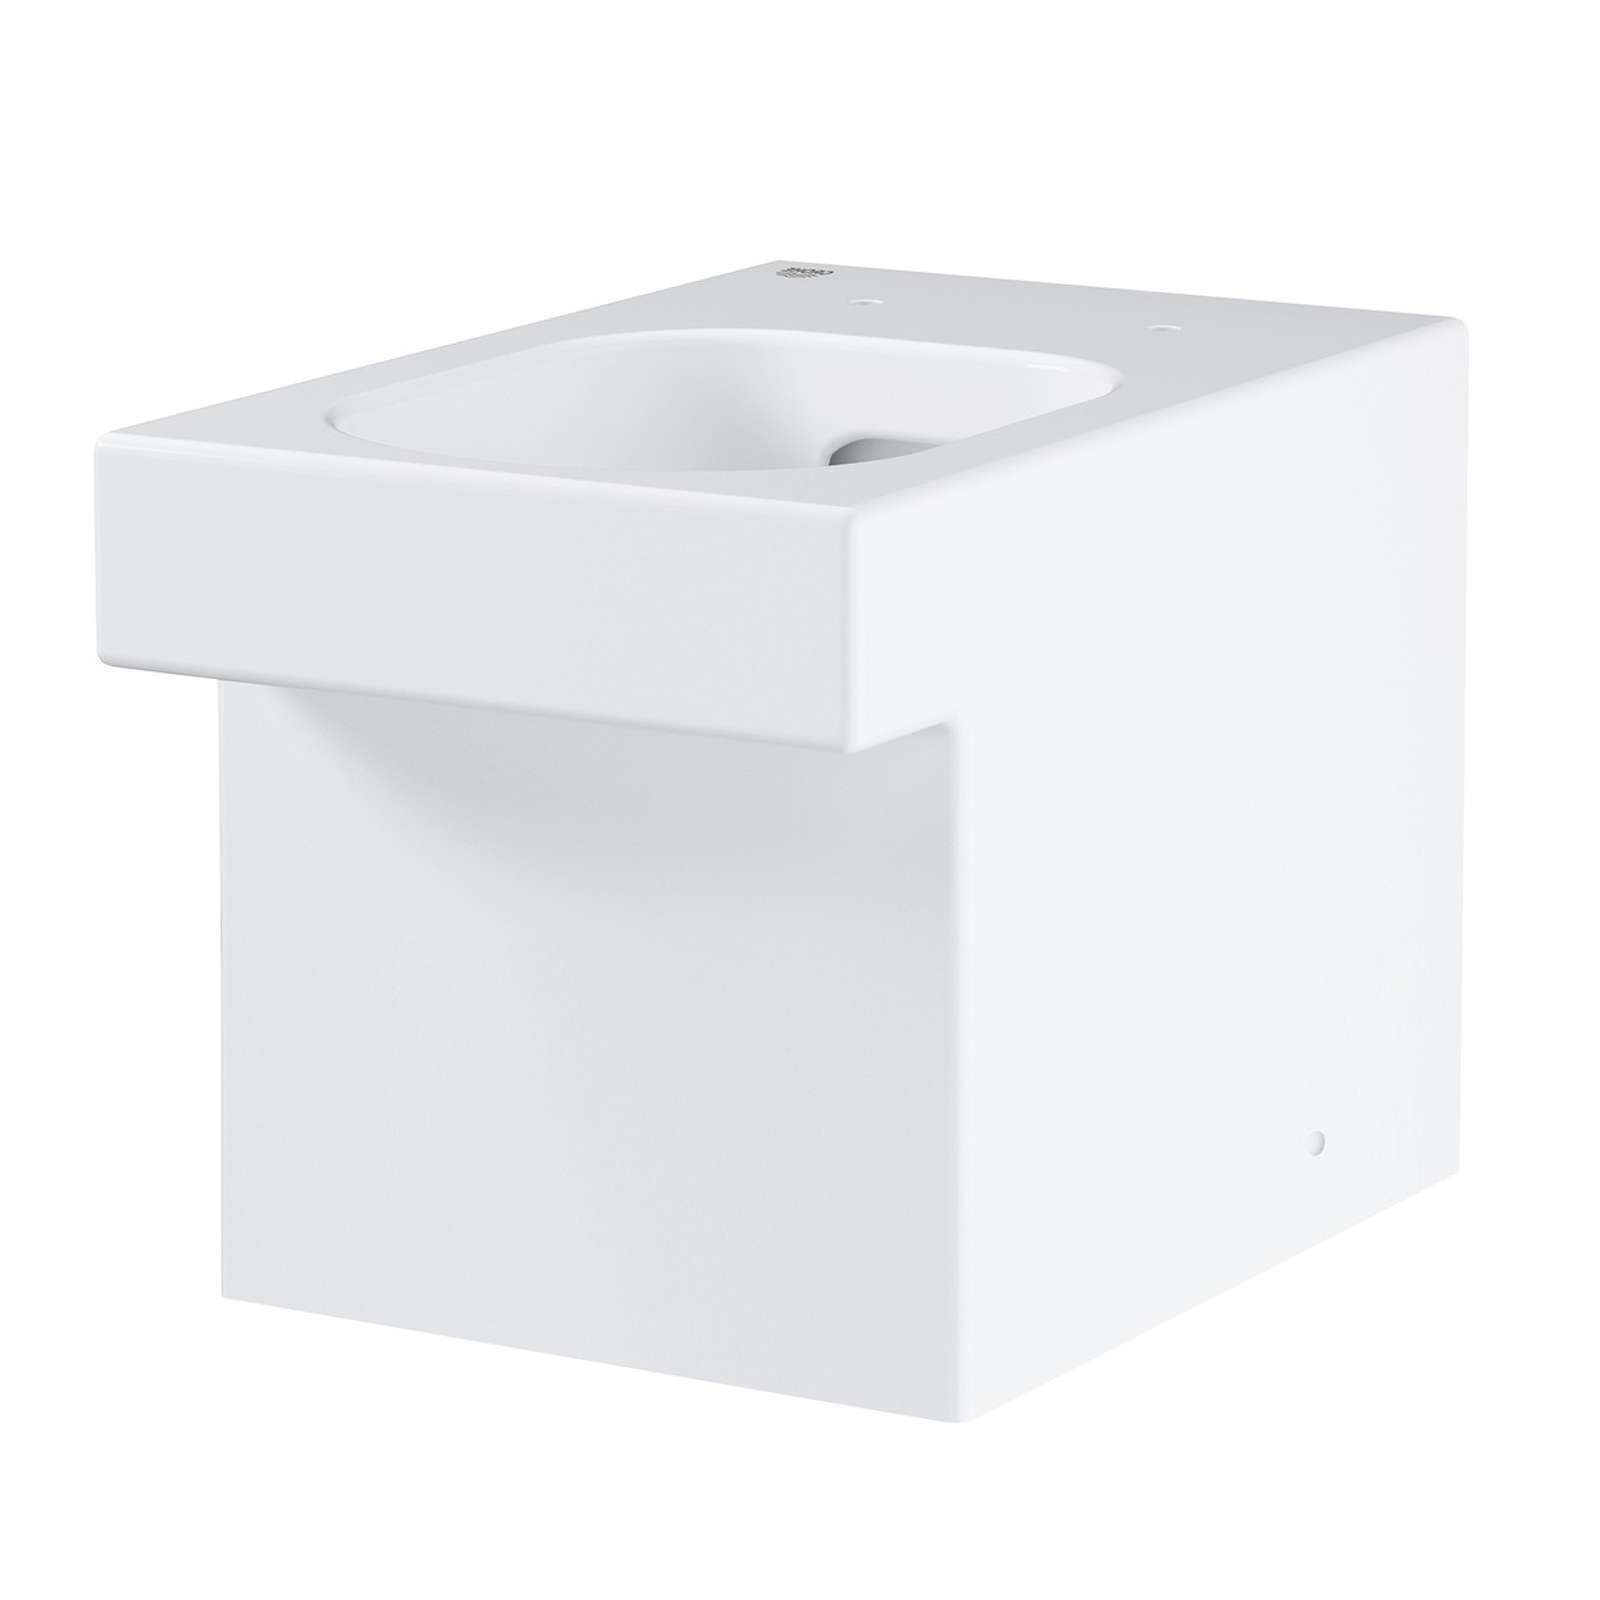 Унитаз приставной Grohe Cube Ceramic 3948500H